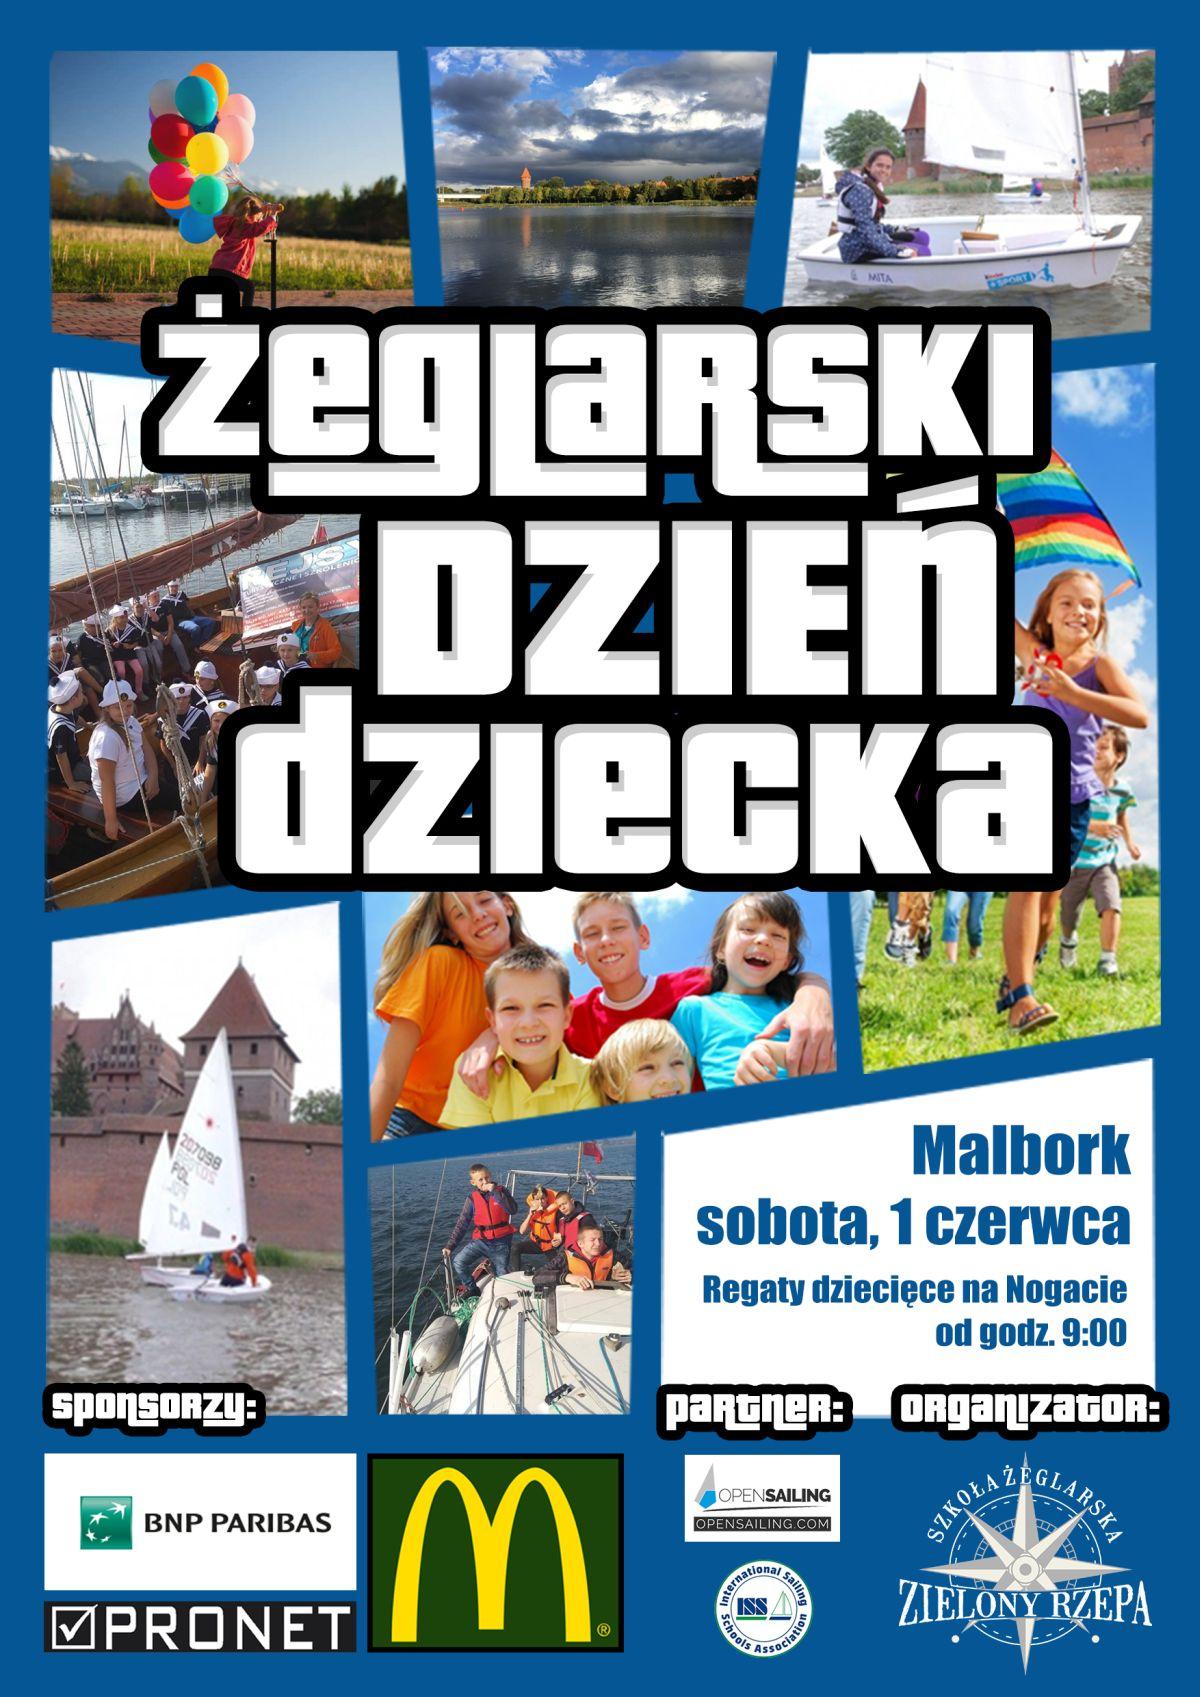 http://m.82-200.pl/2019/05/orig/dzien-dziecka-malbork-4583.jpg